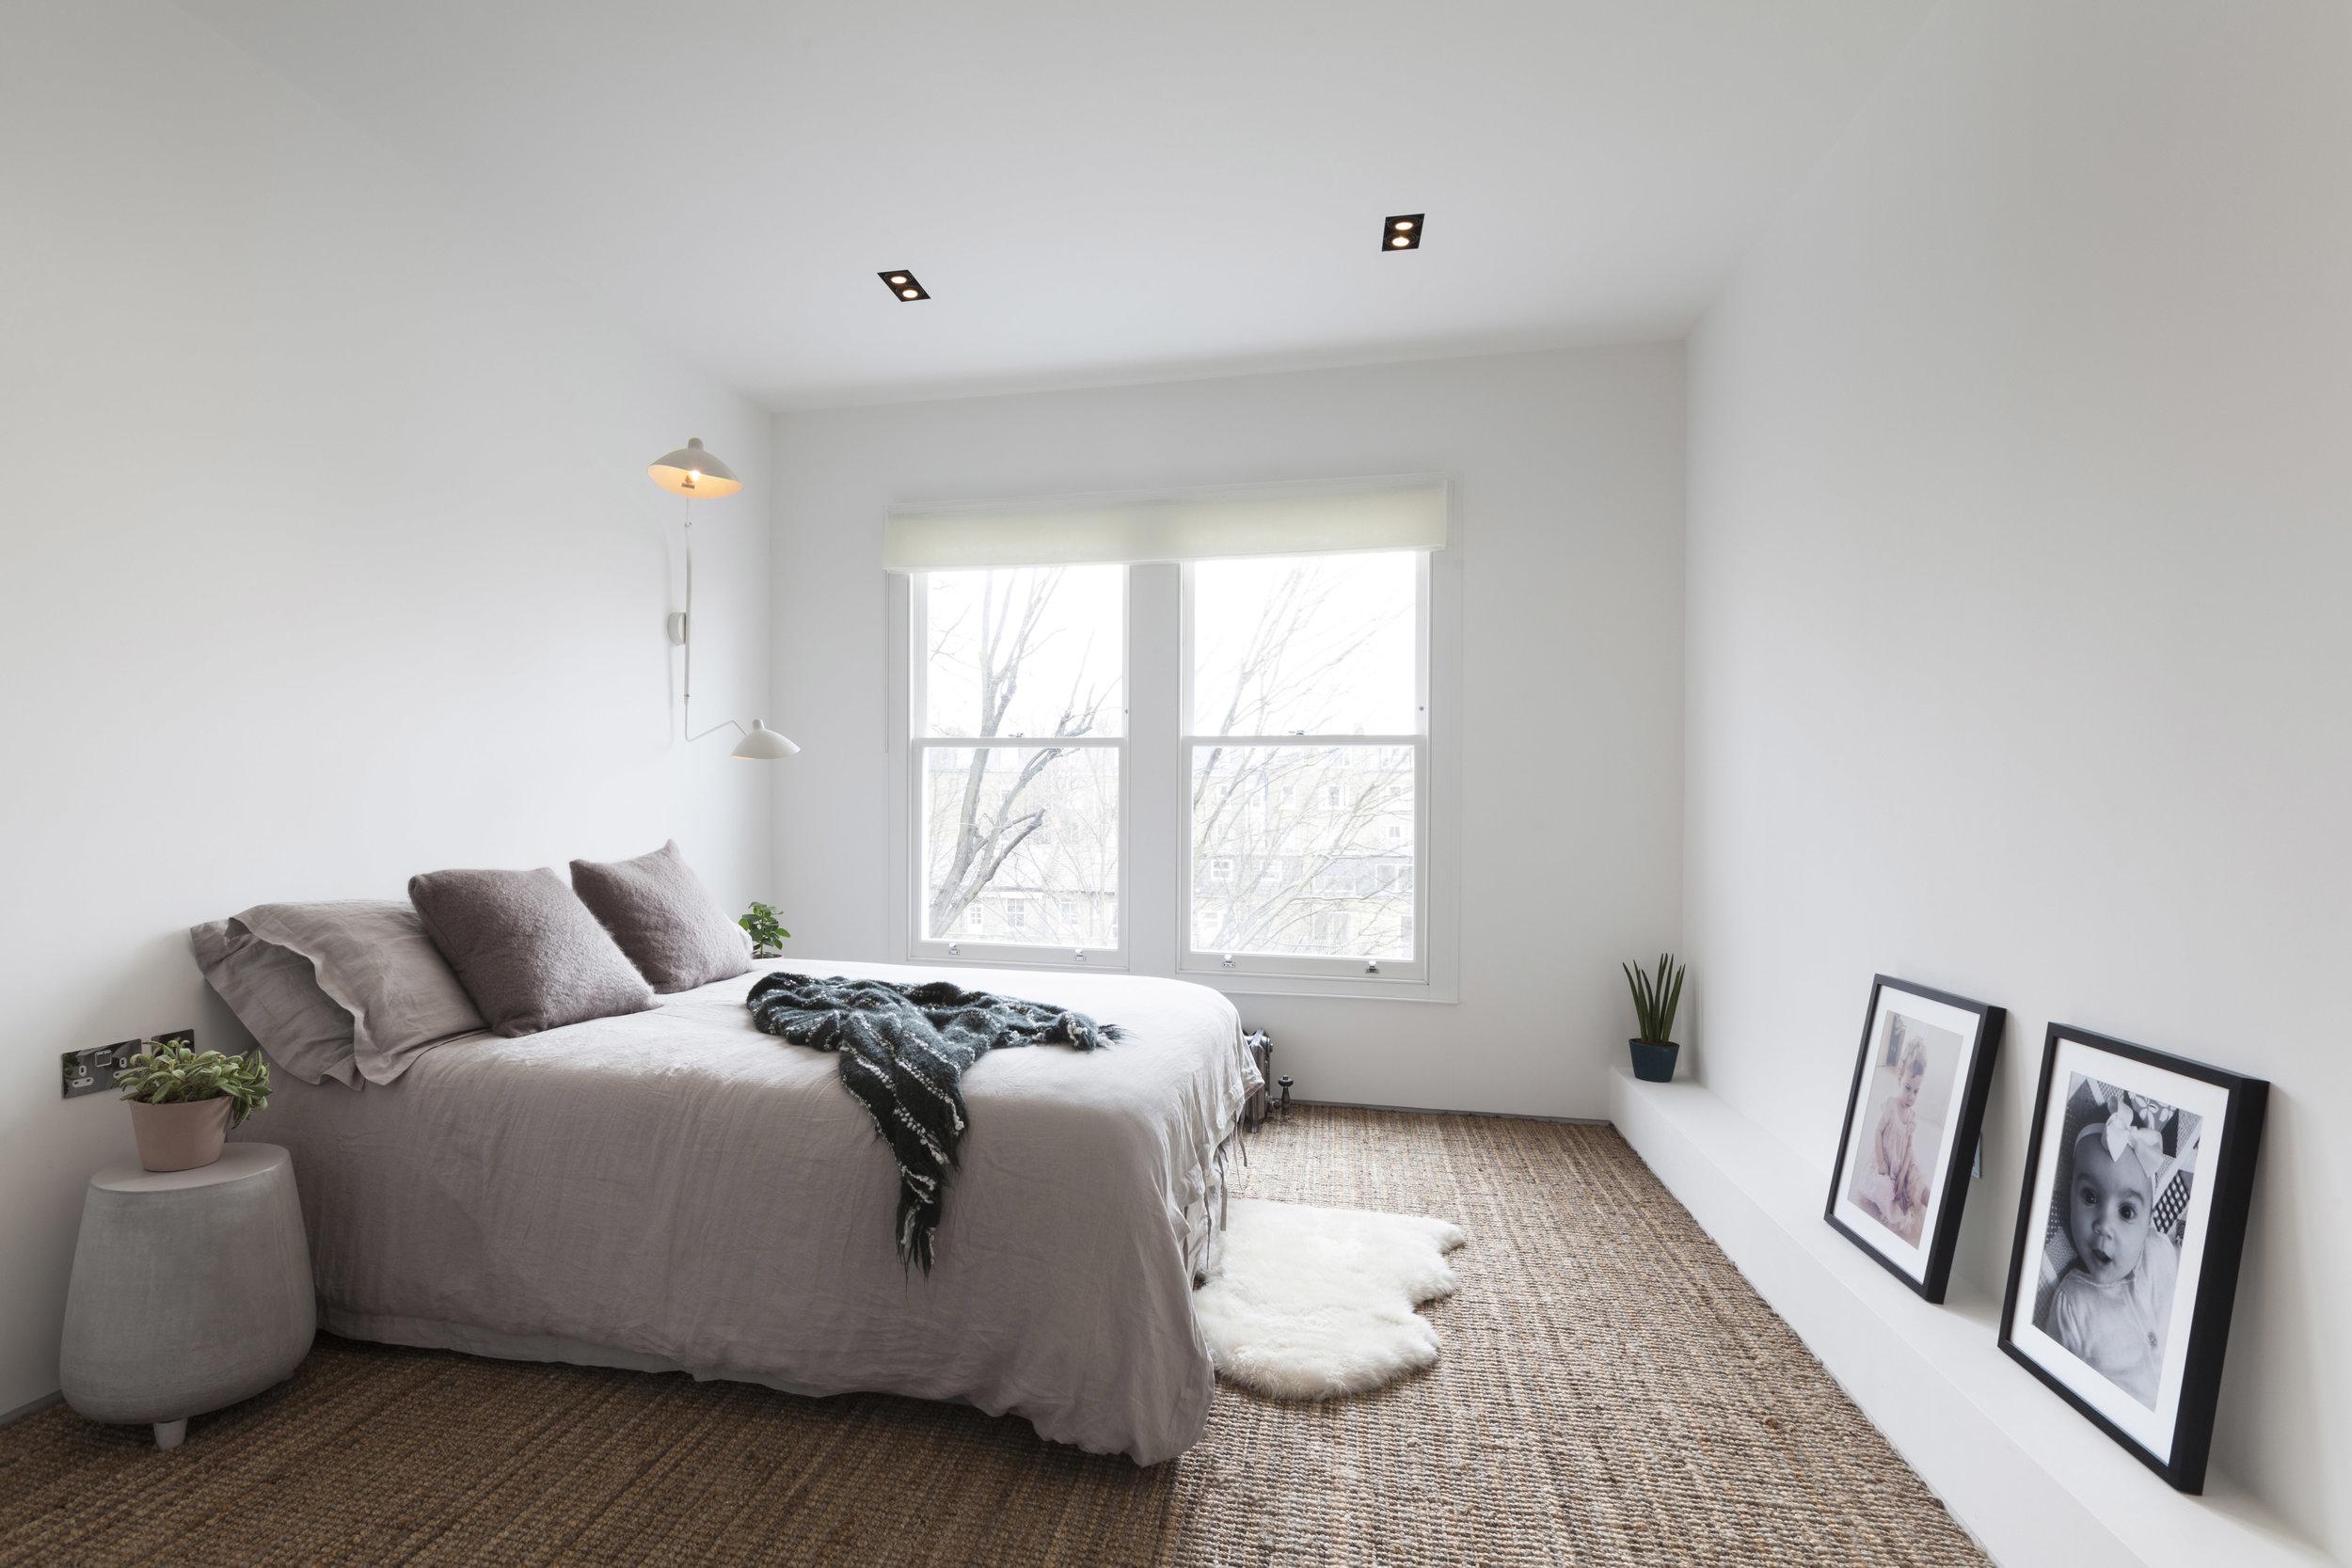 Domus-Nova-Sinclair-Road-London-Property-For-Sale-6.jpg